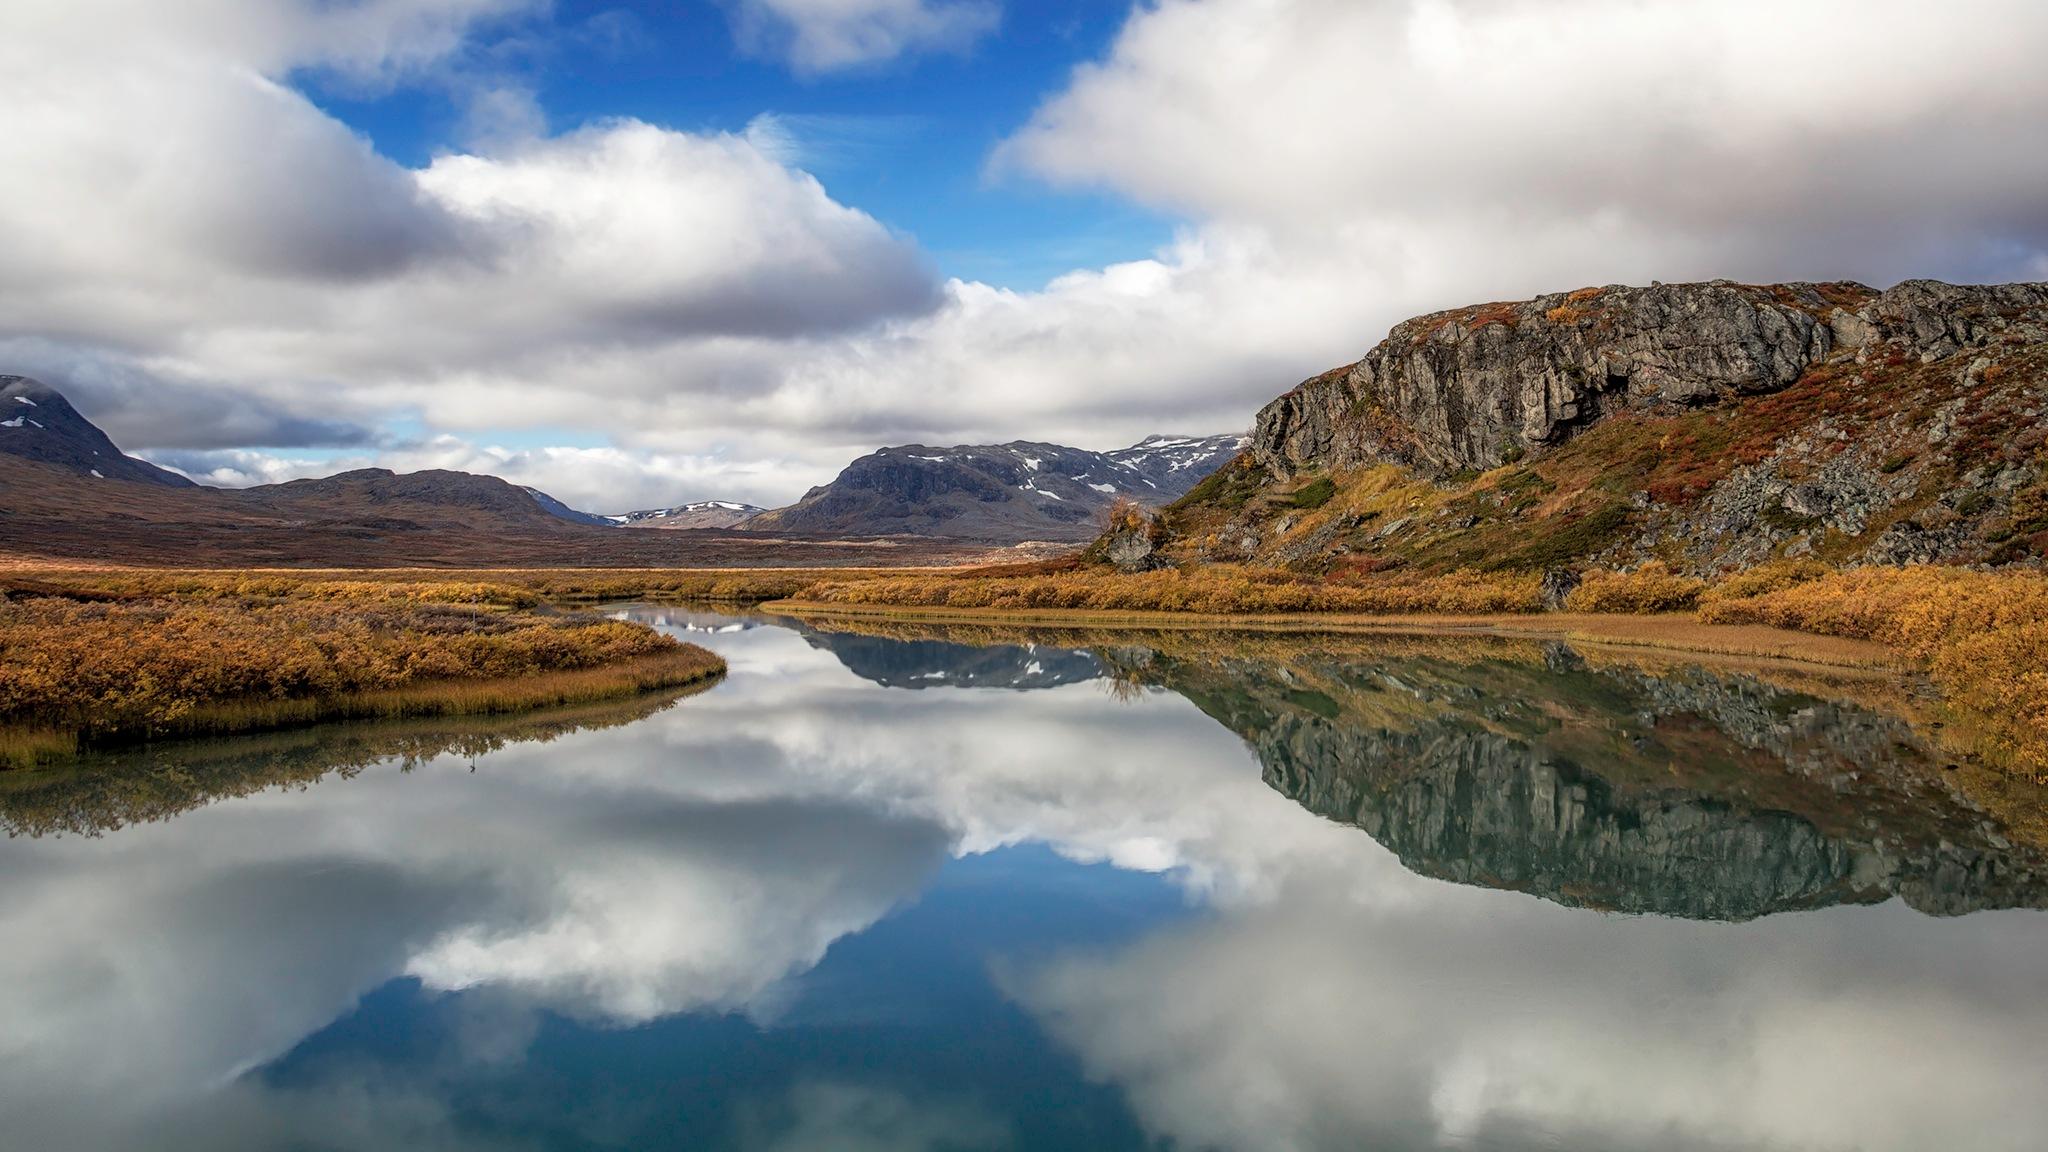 View from the bridge by Henrik Wanders